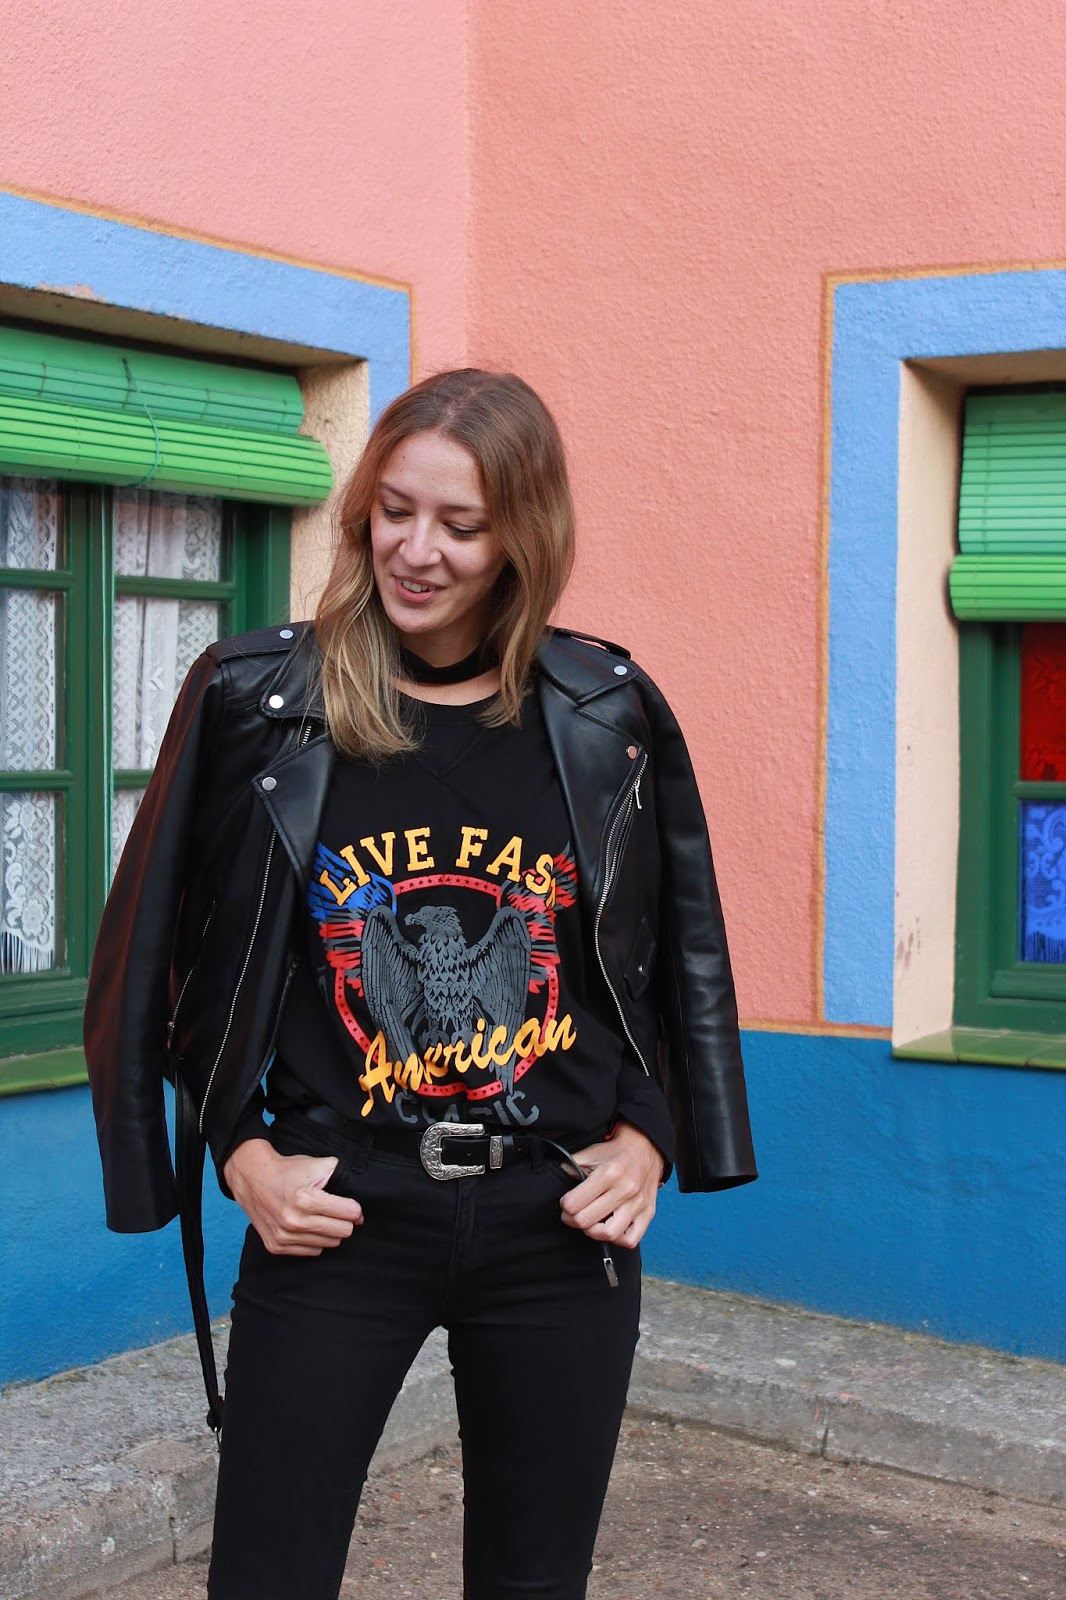 rock-street-style-choker-t-shirt-eagle-print